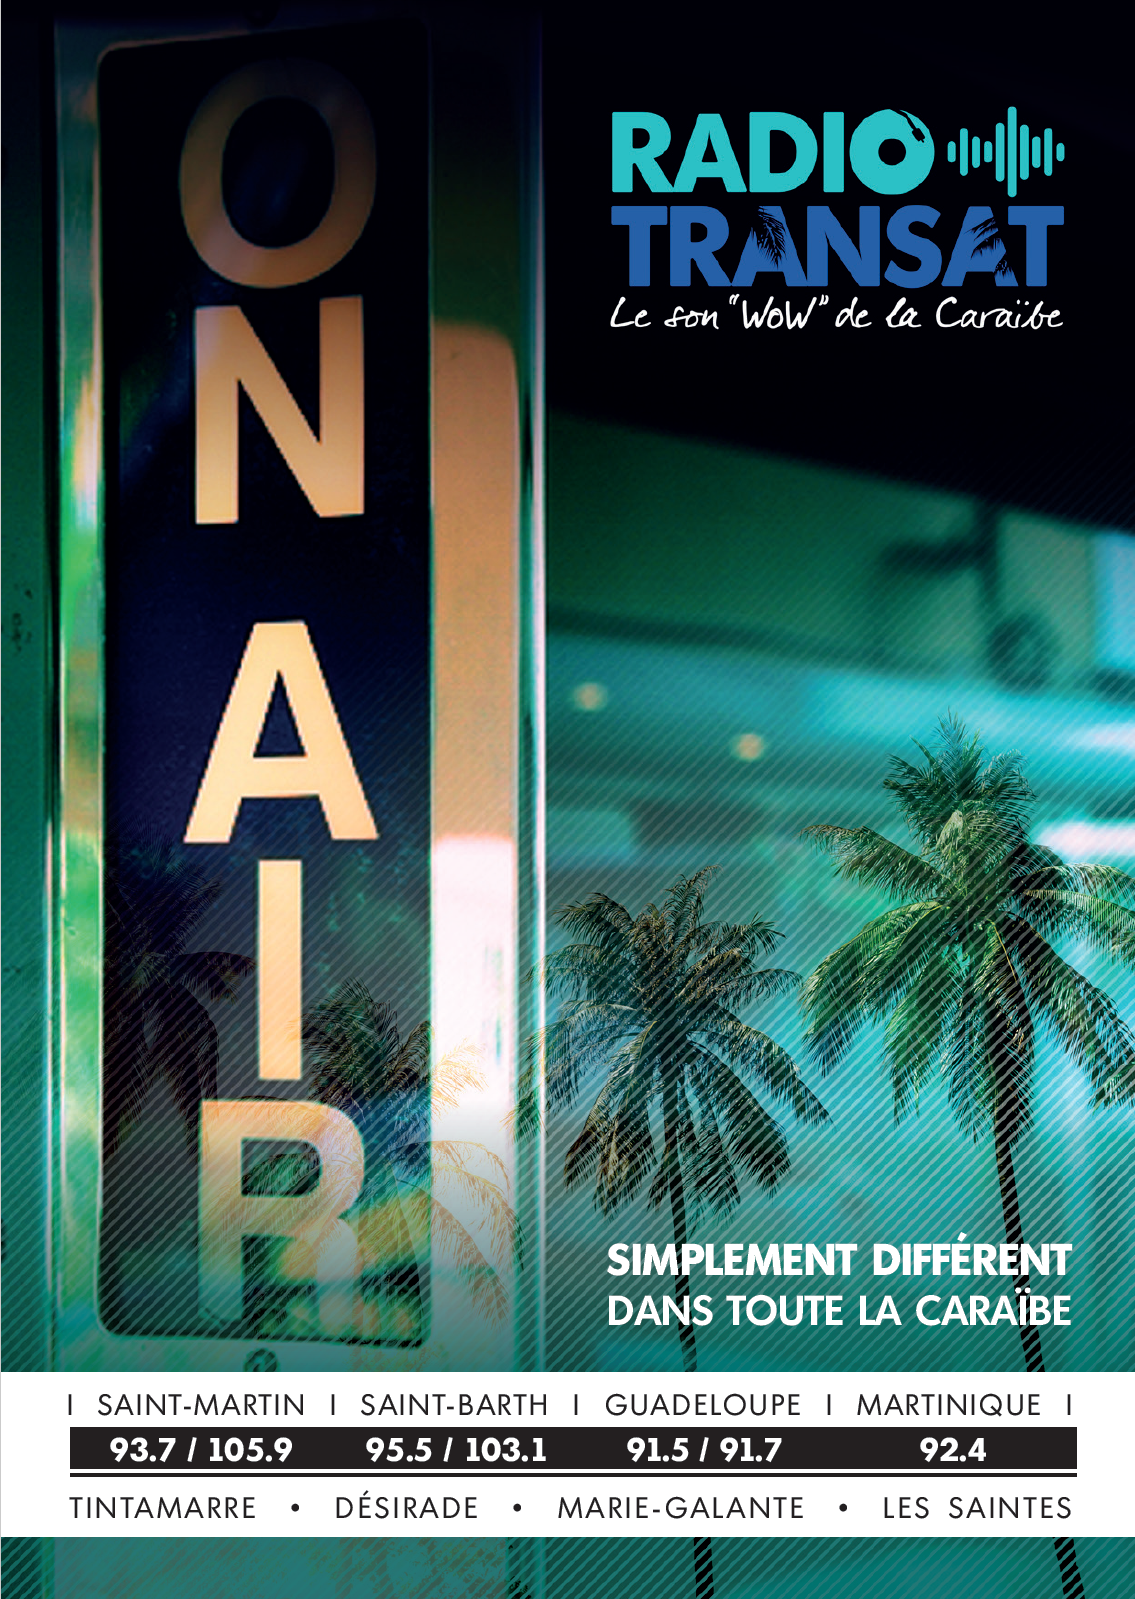 Régie Caraibes n°1 commercialise Radio Transat